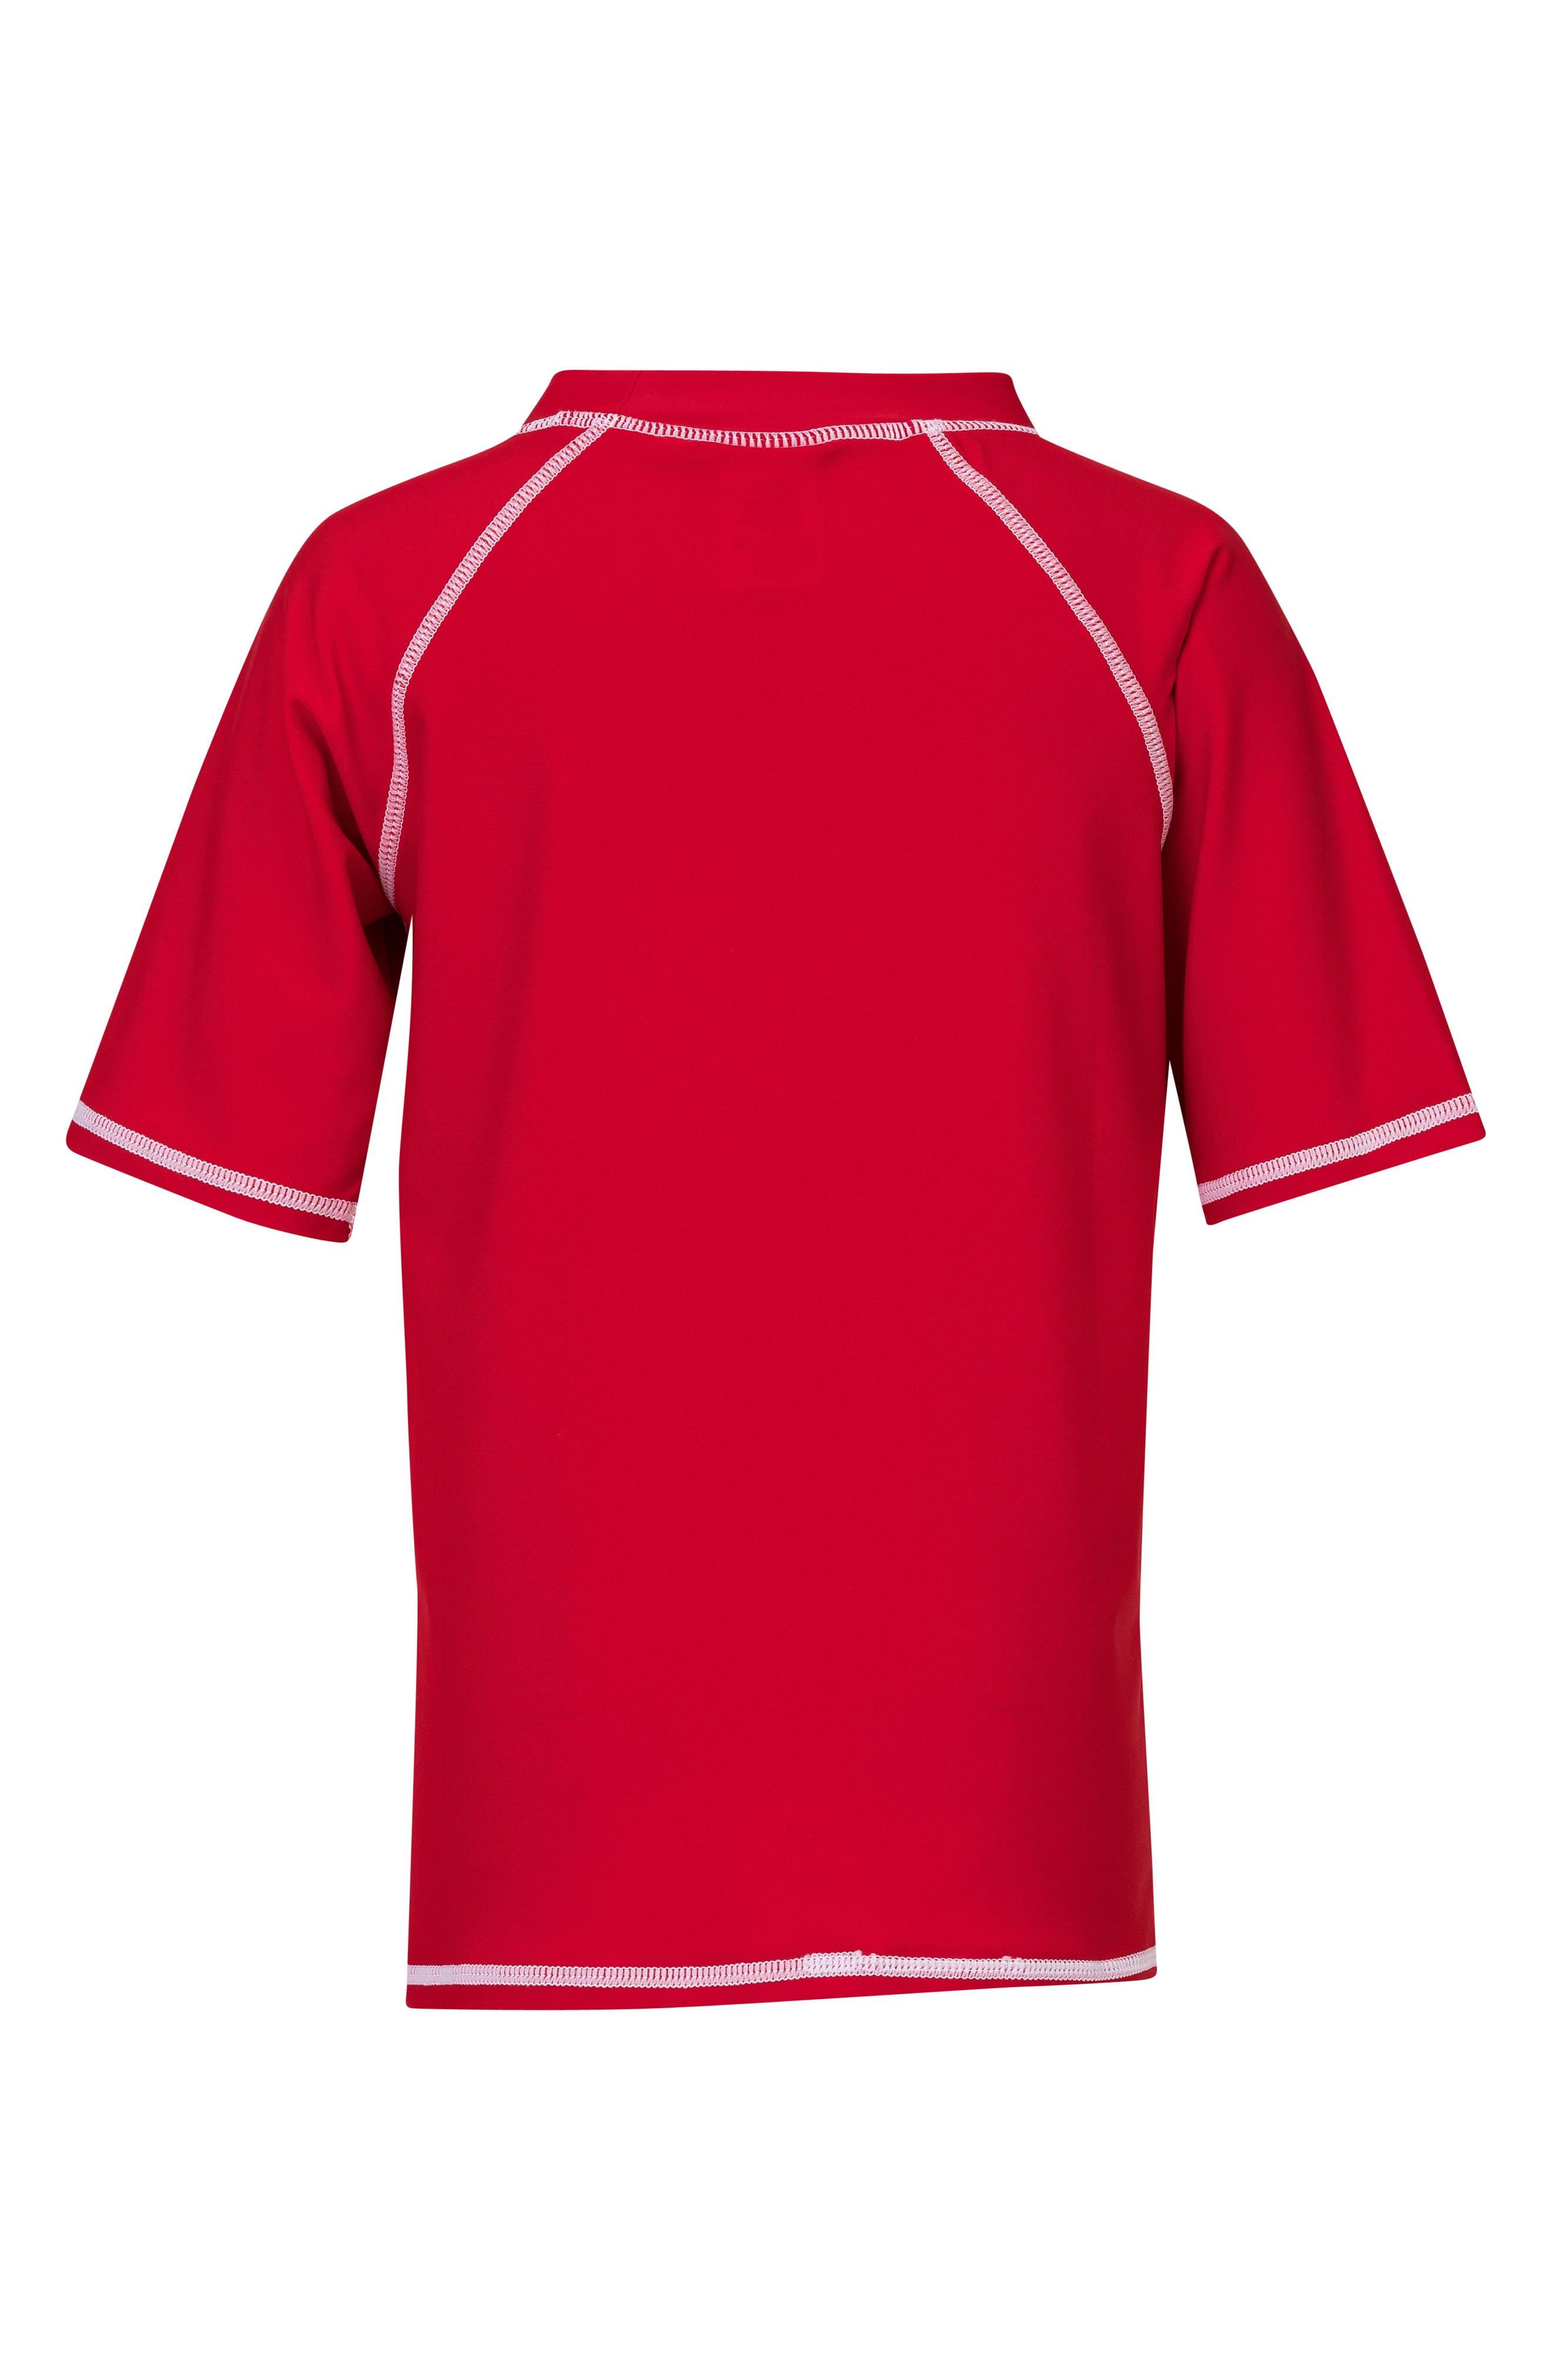 Raglan Short Sleeve Rashguard,                             Alternate thumbnail 2, color,                             Red